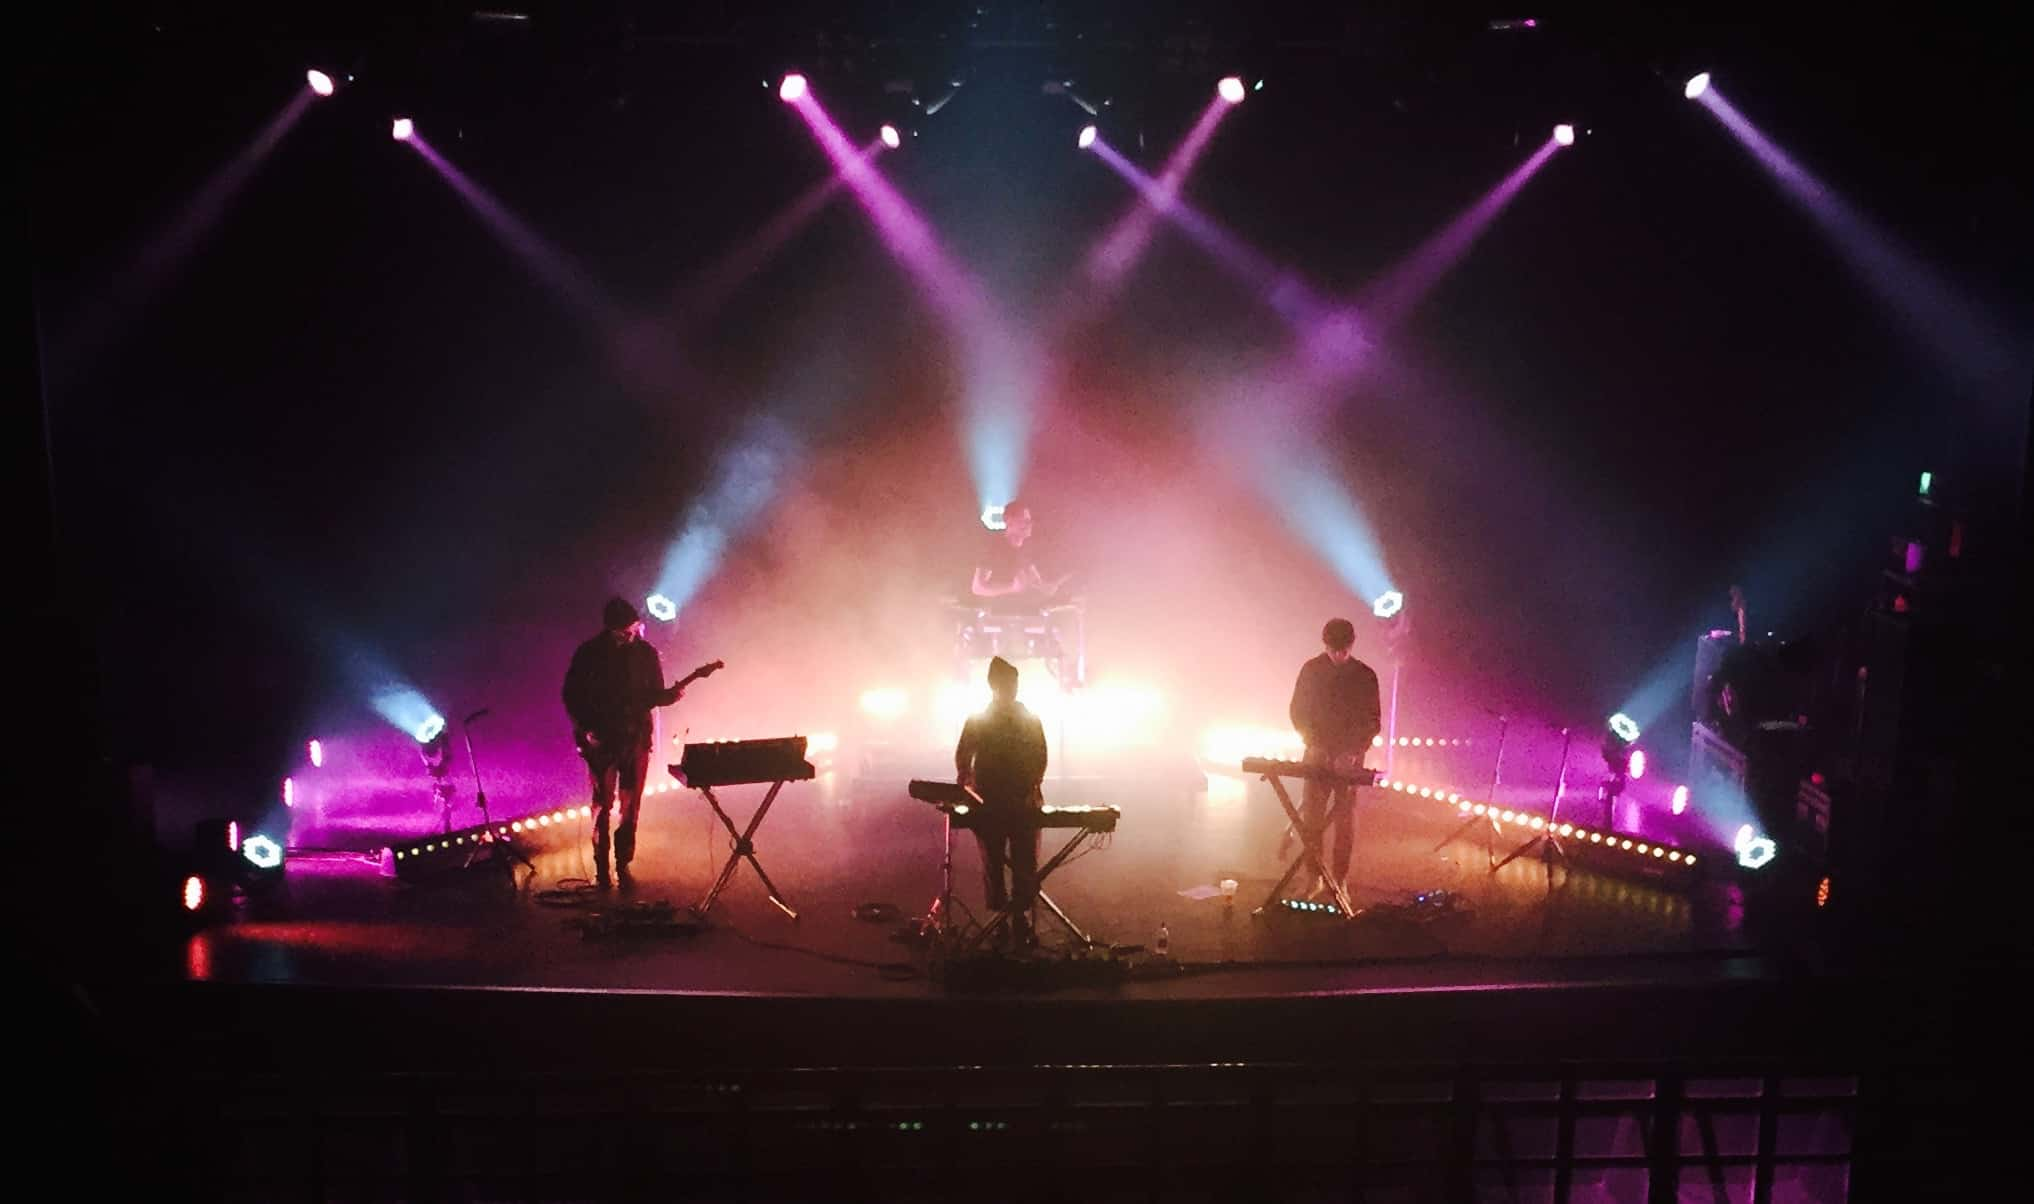 Shura Live Tour - Lighting Support Vortex Events